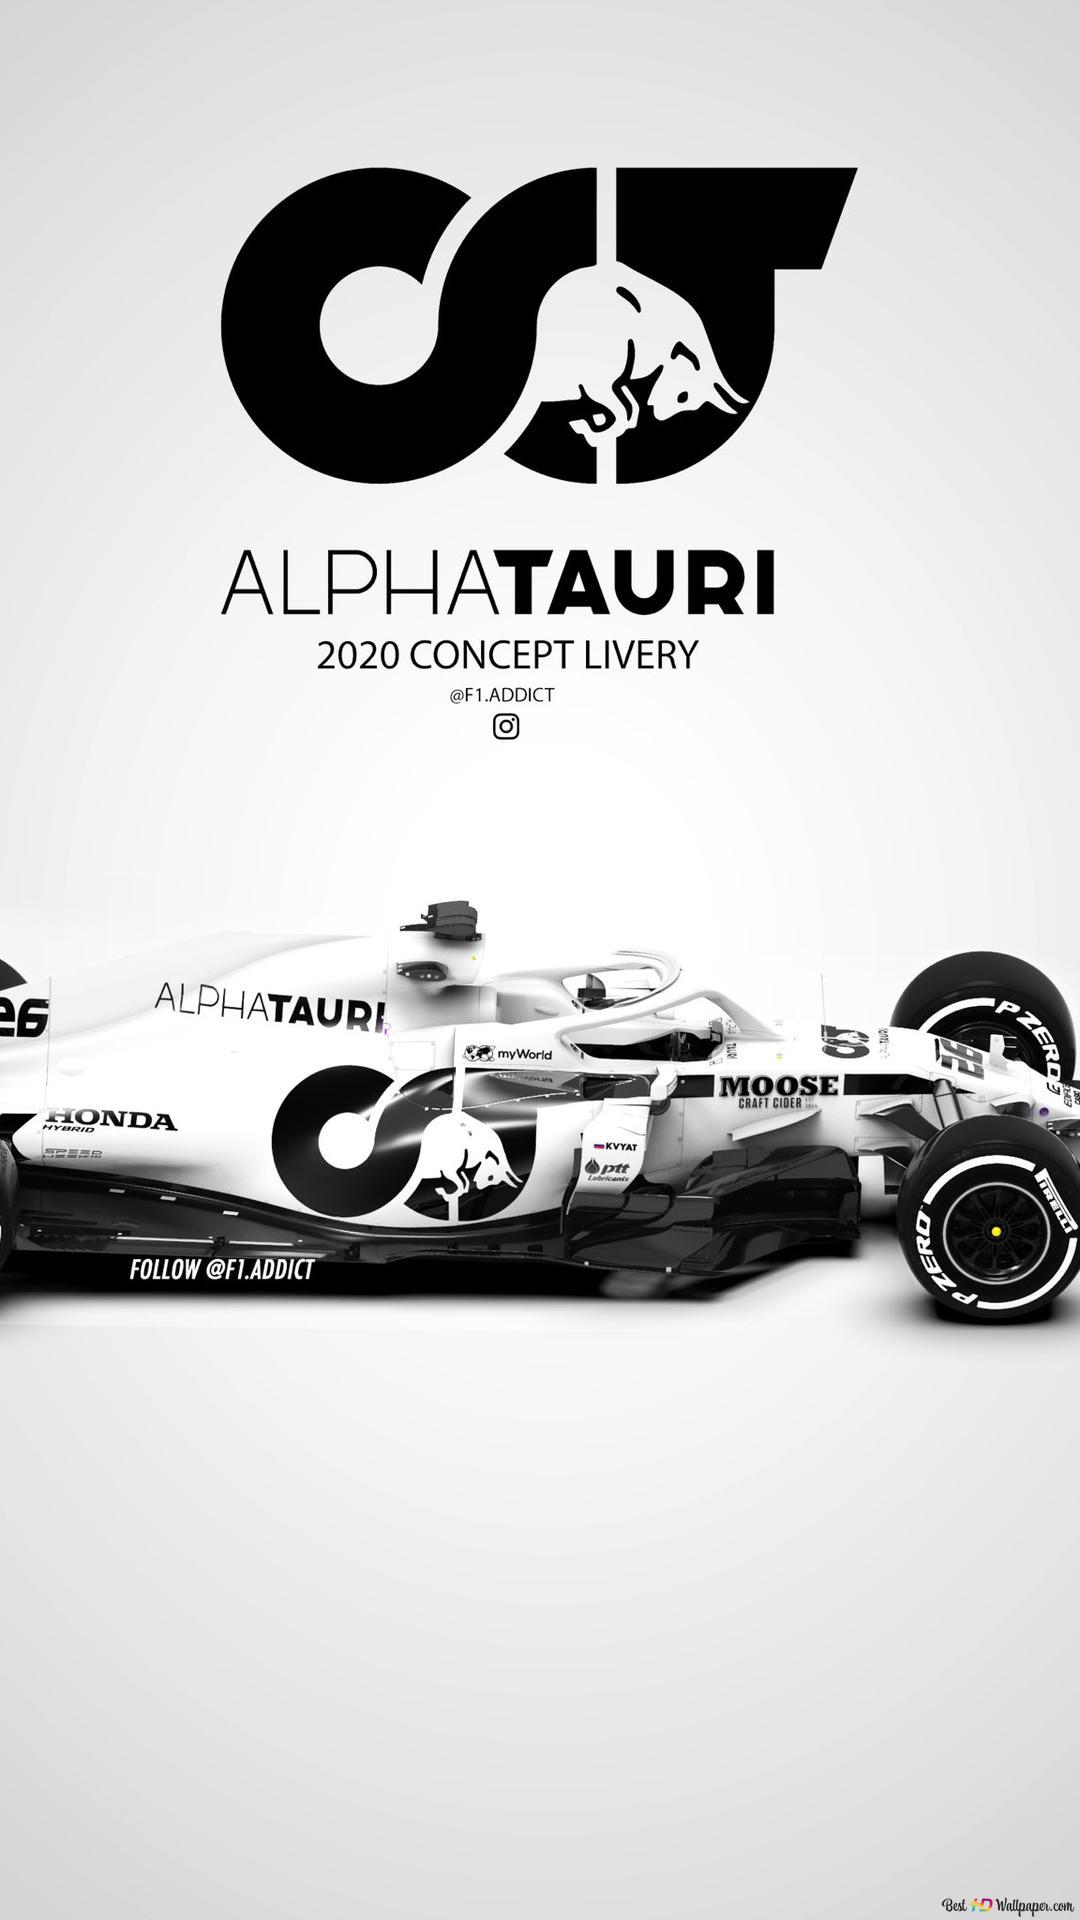 F1アルファタウリtorroロッソ Hd壁紙のダウンロード